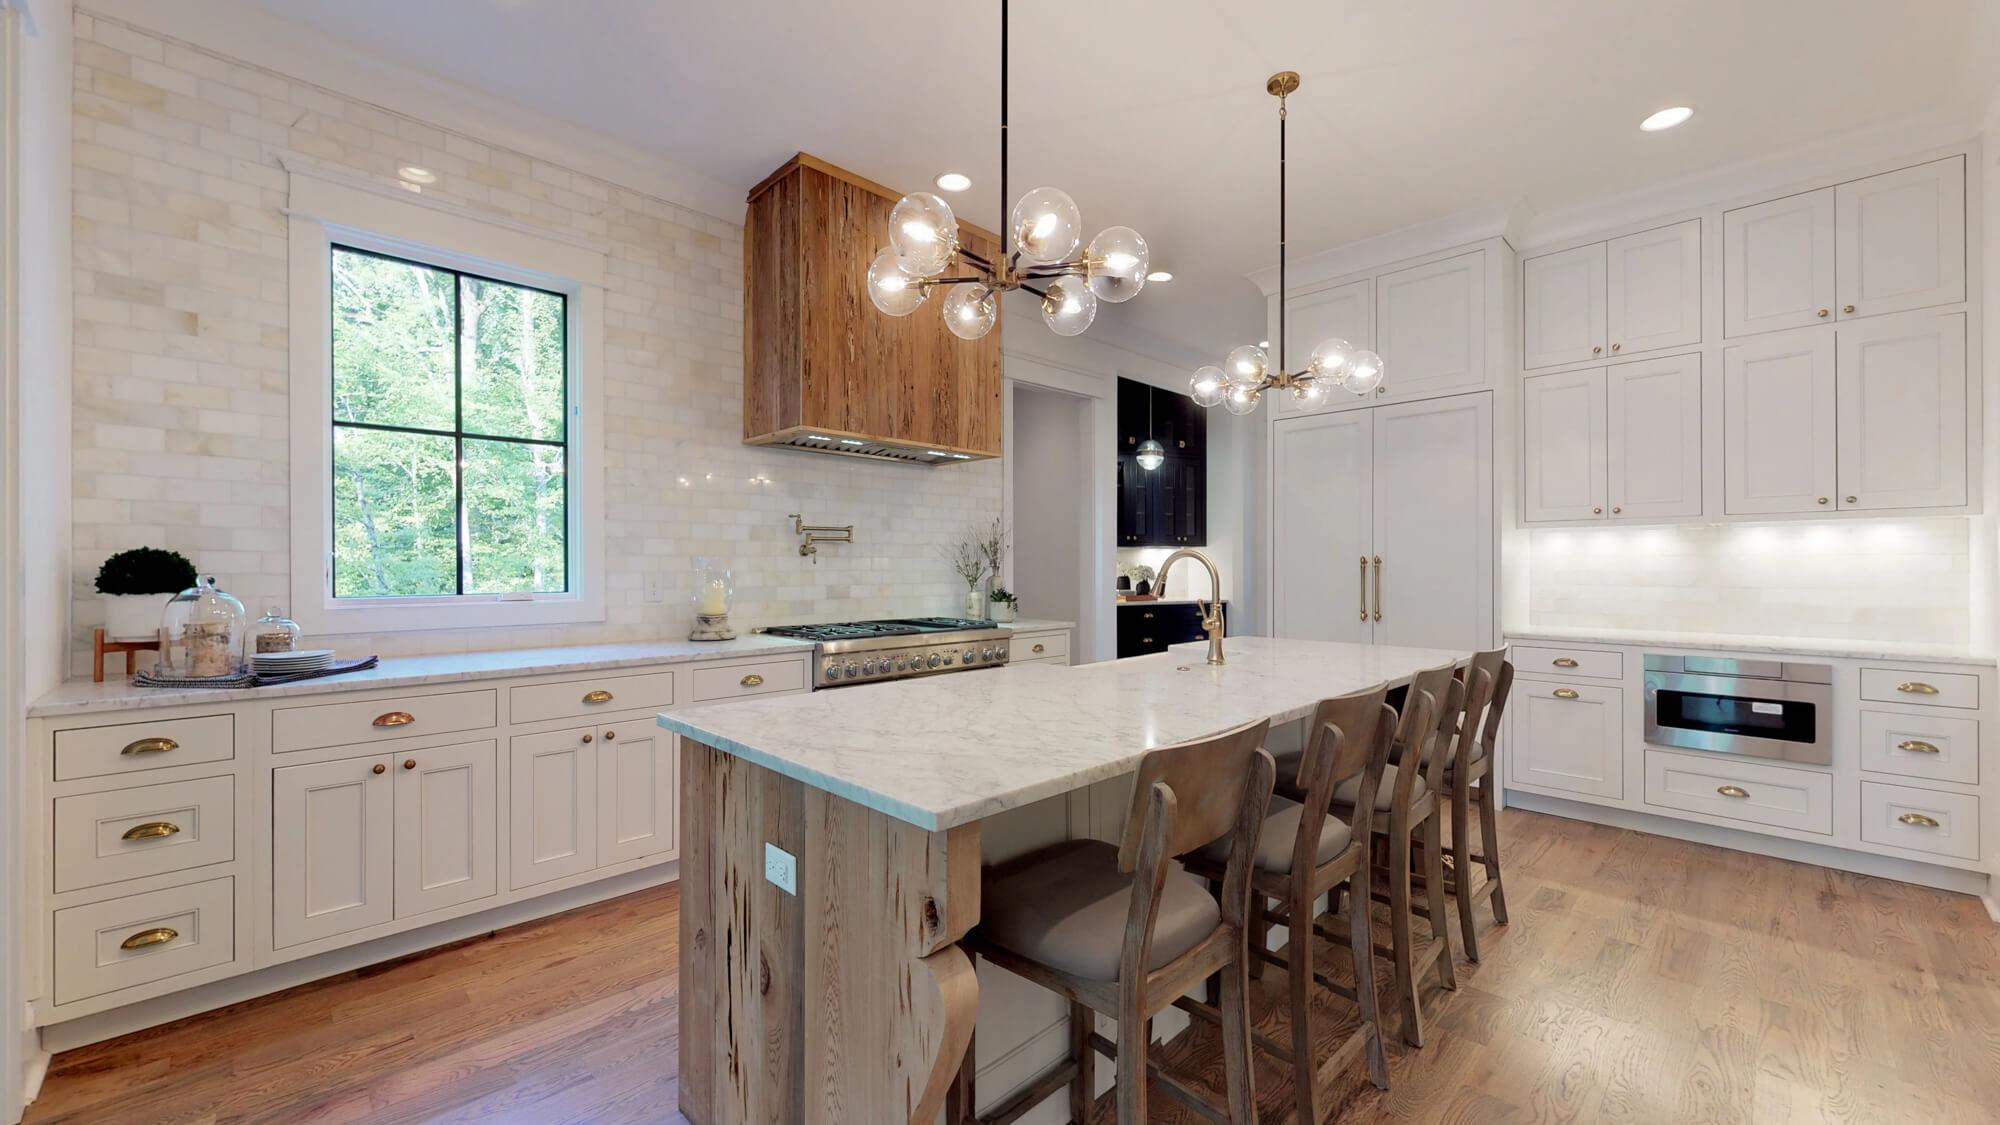 chandelier-development-avery-brentwood-tennessee-215757.jpg